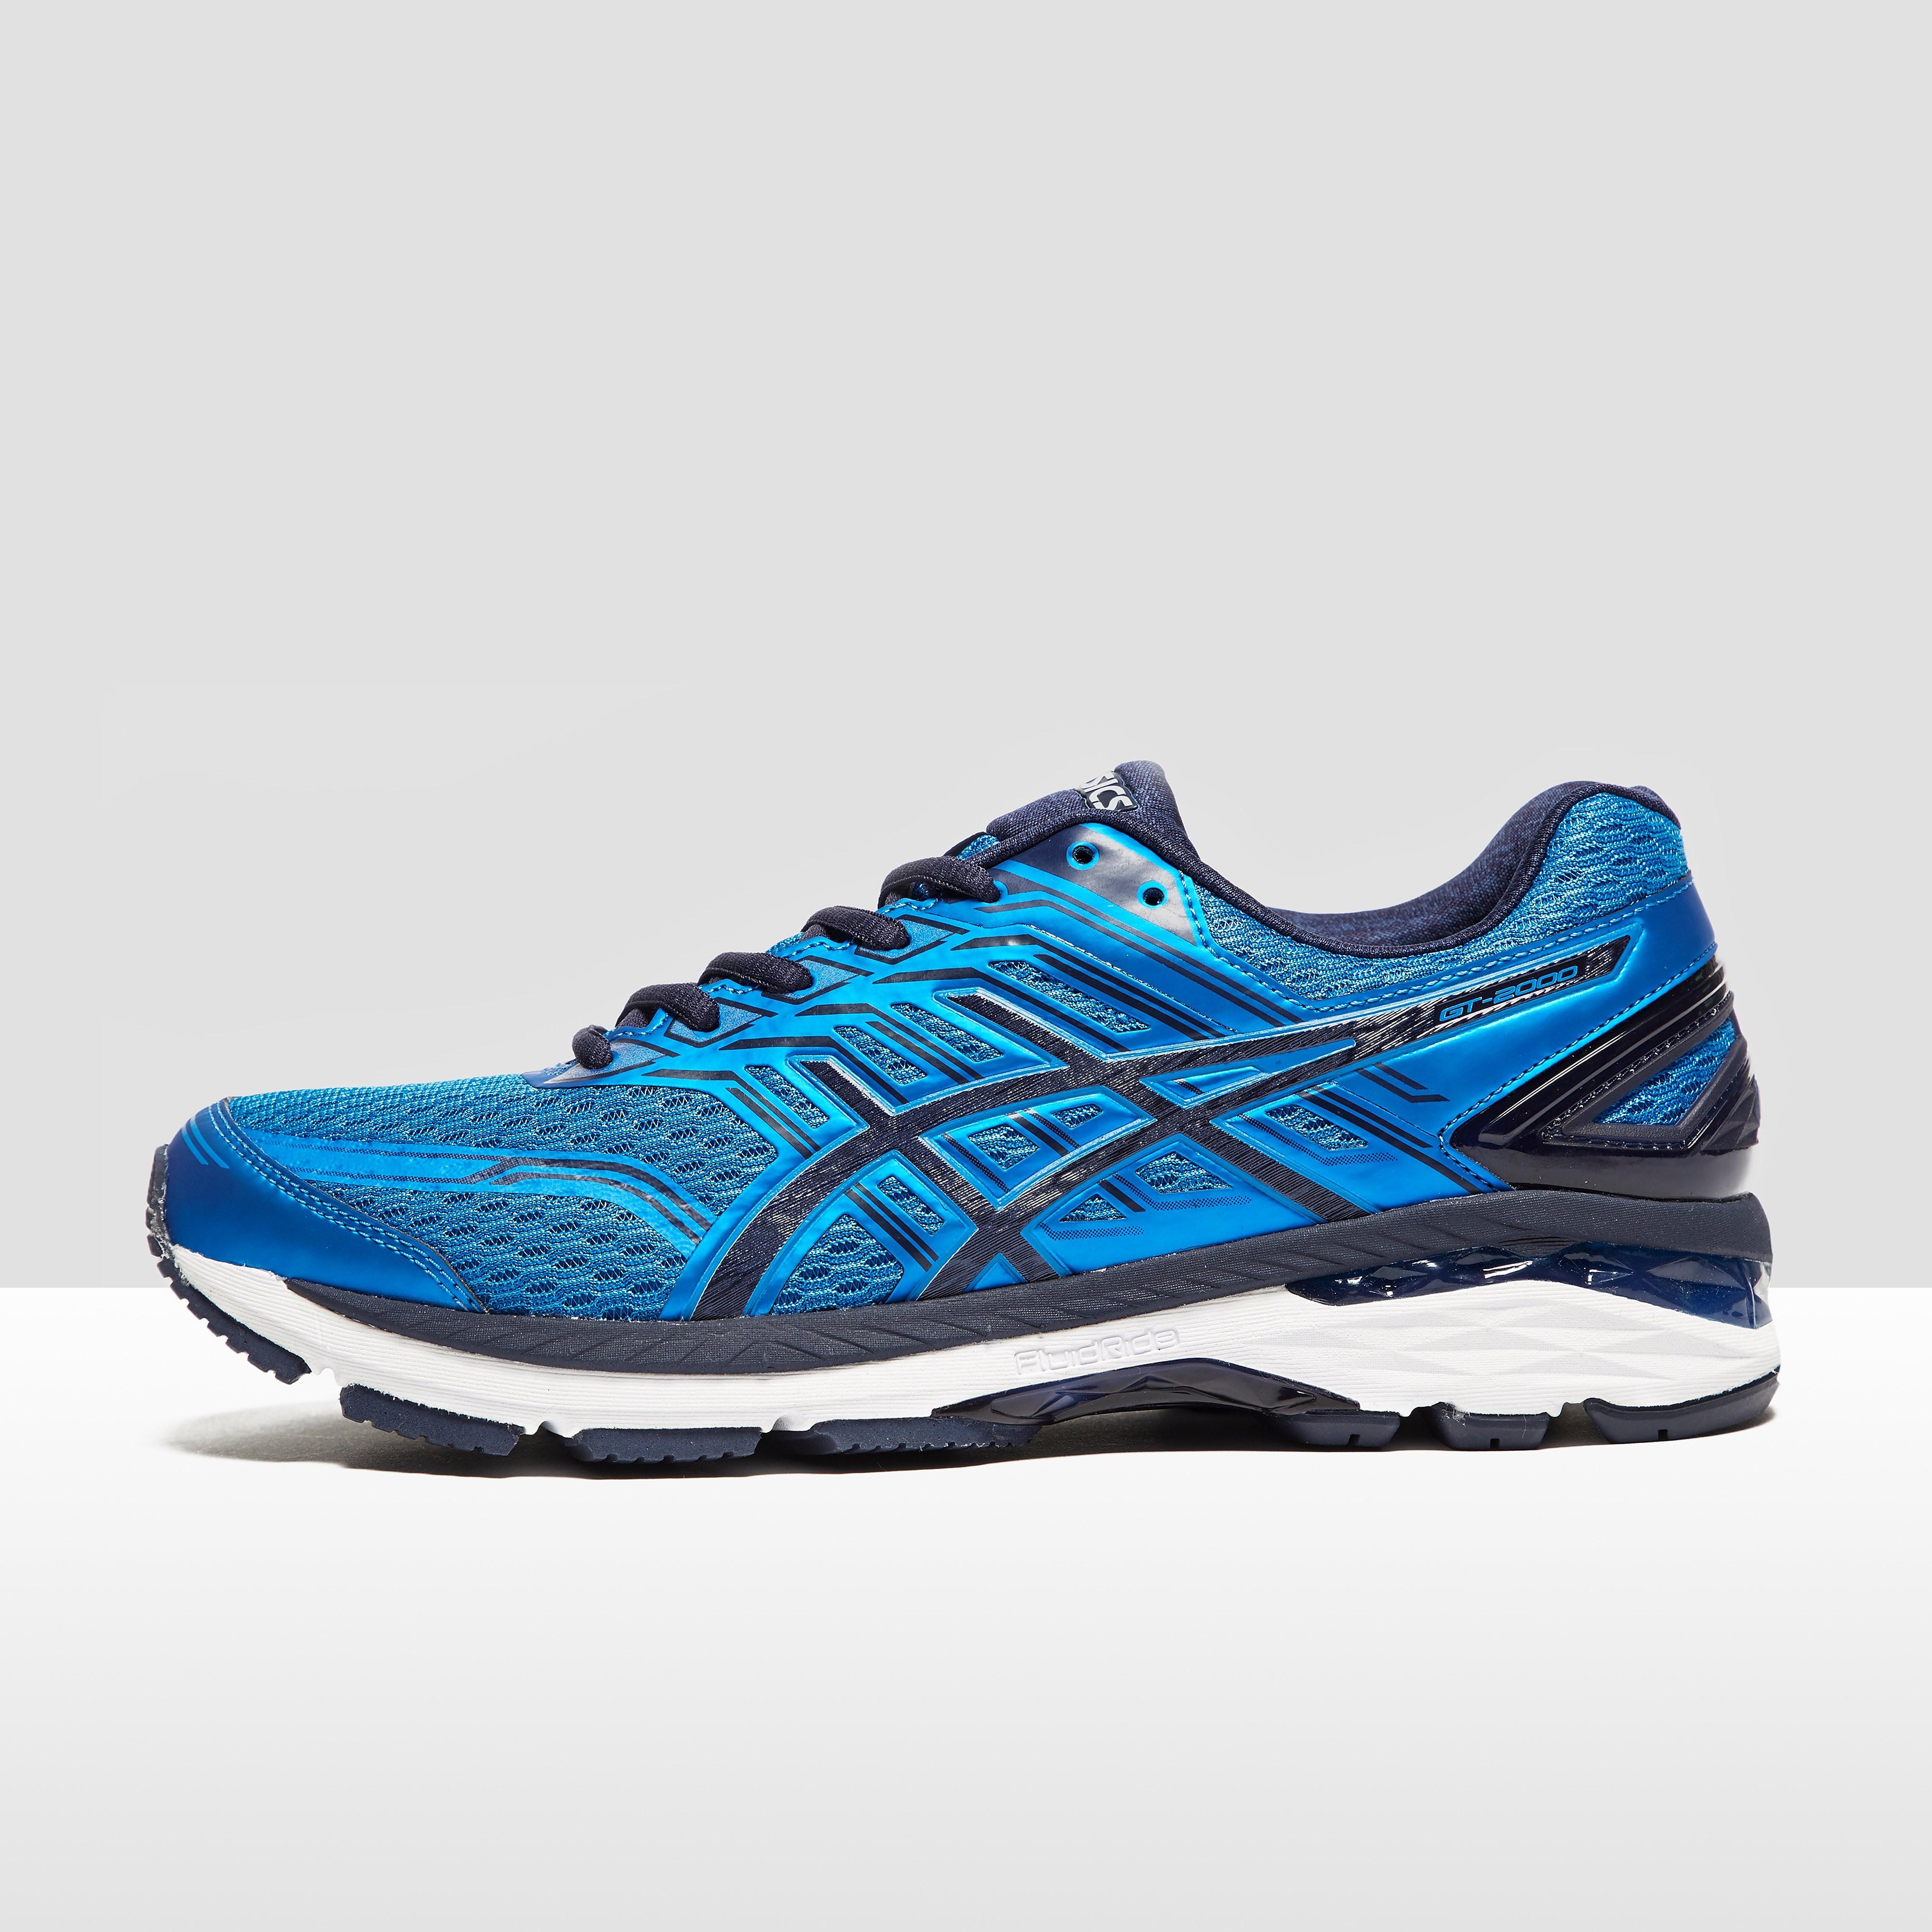 ASICS GT-2000 5 Men's Running Shoes